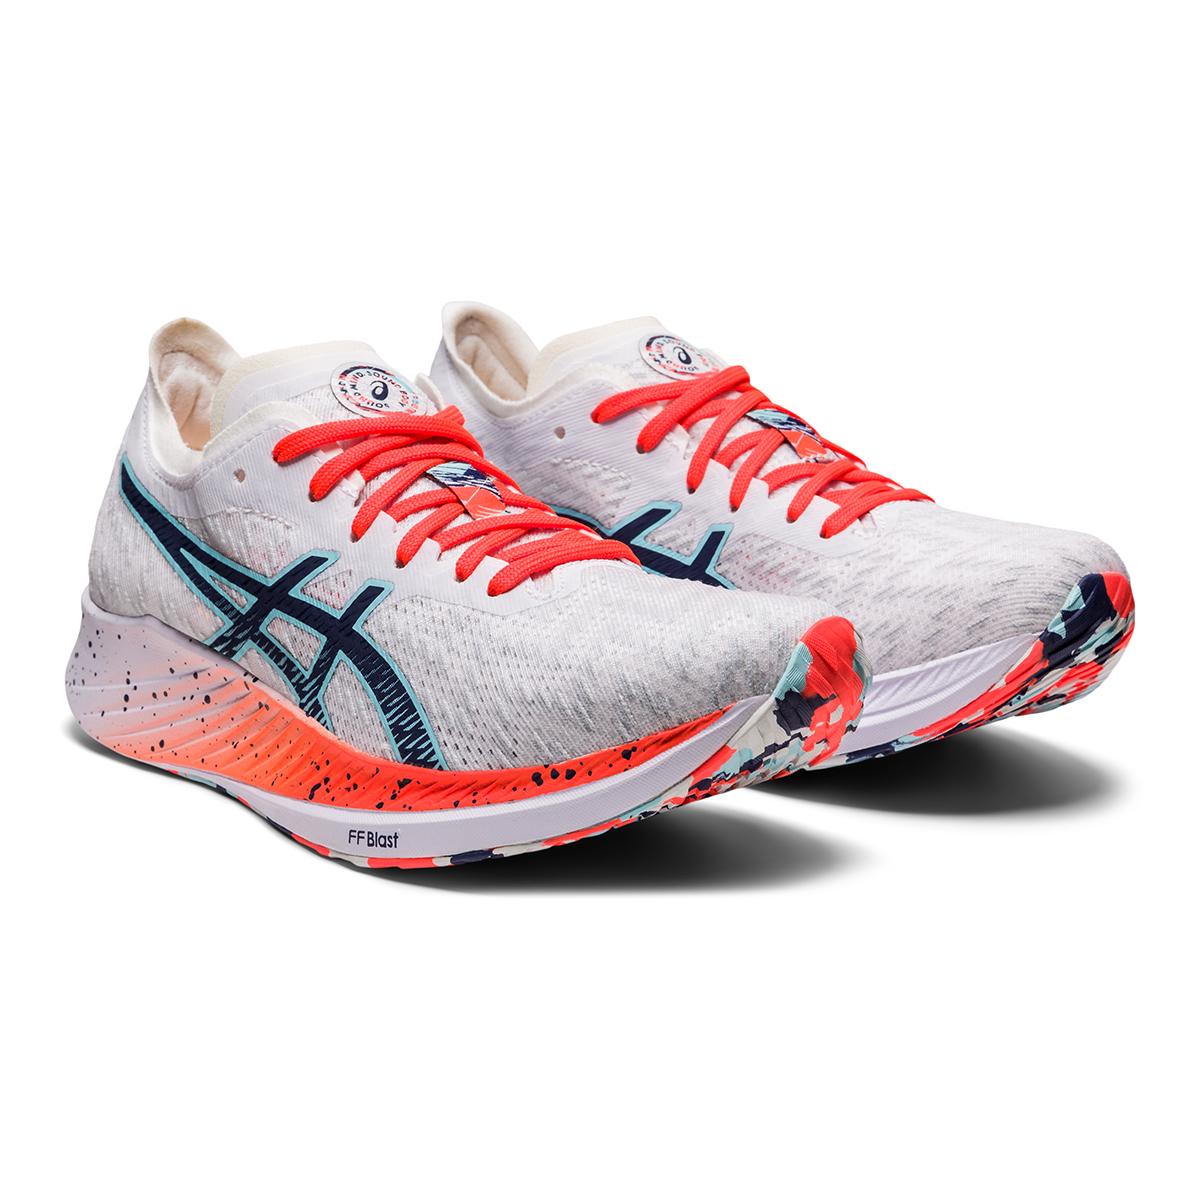 Women's Asics Magic Speed Running Shoe - Color: White/Thunder Blue - Size: 5 - Width: Regular, White/Thunder Blue, large, image 5